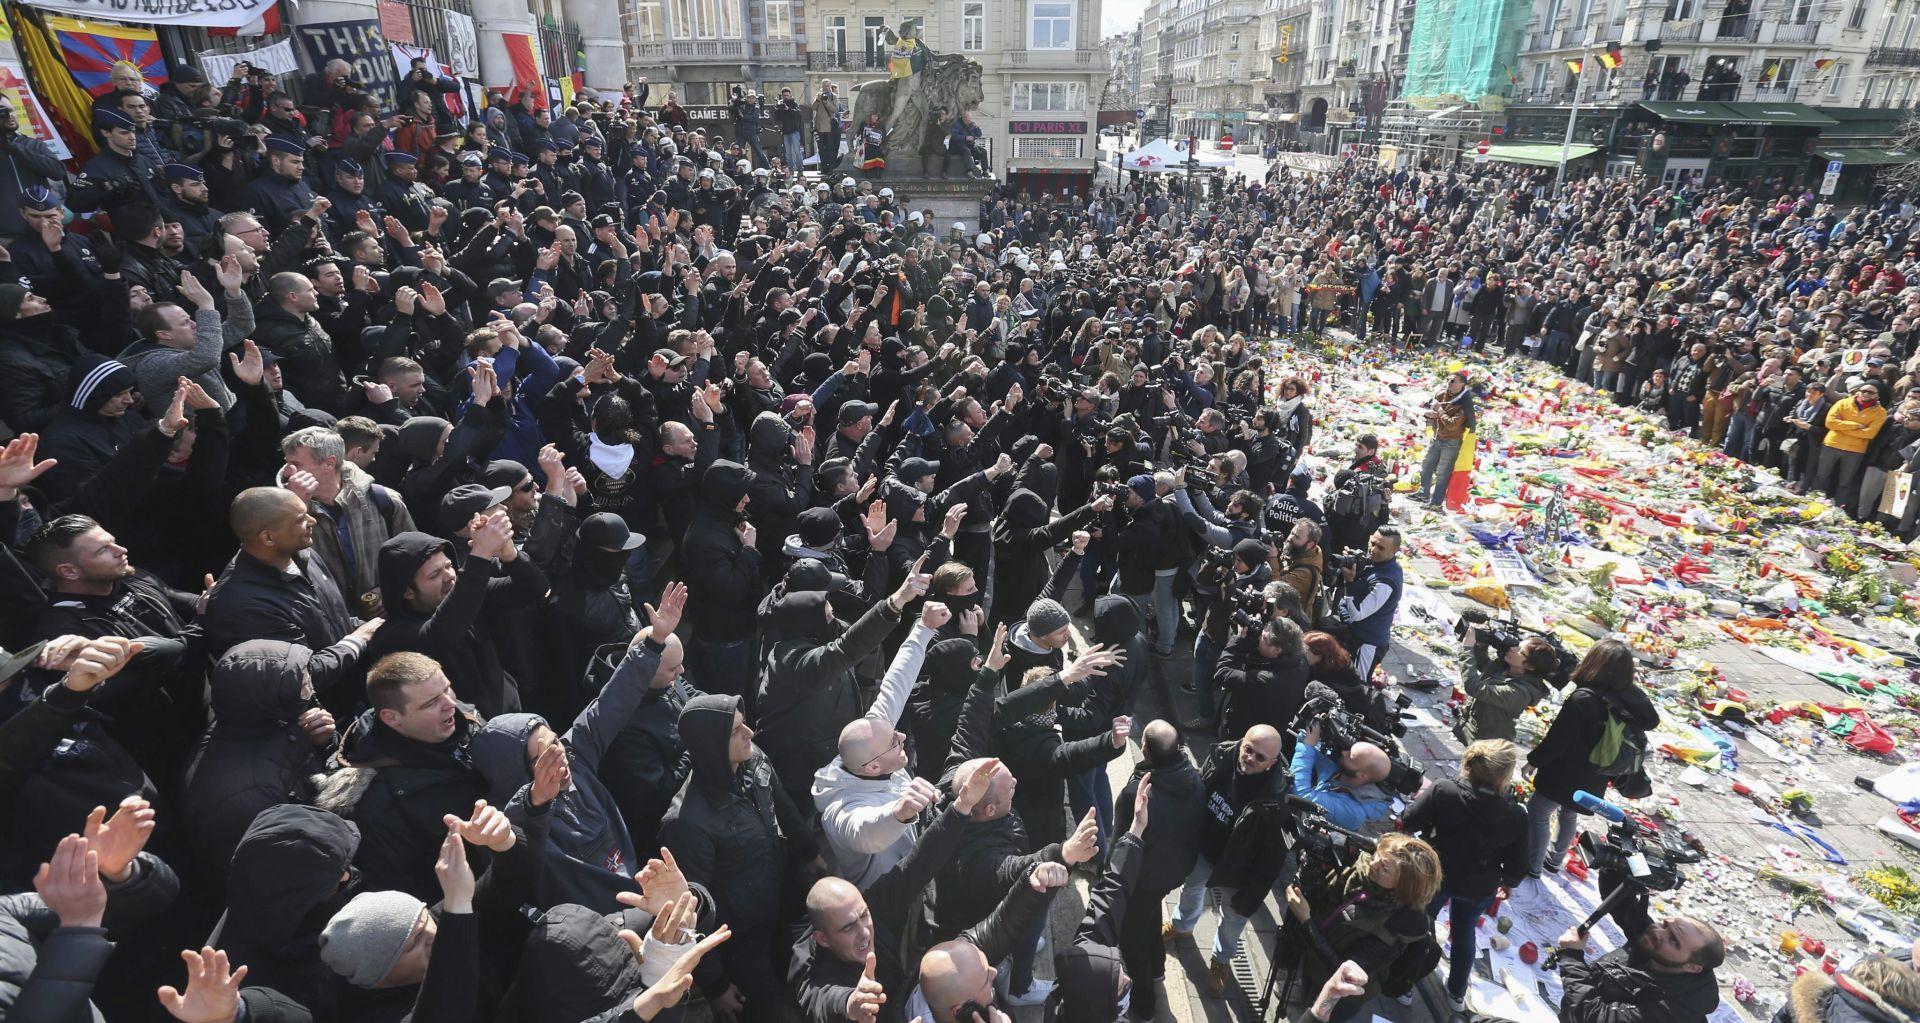 BRUXELLES Mirno okupljanje građana poremetili neonacisti, policija reagirala vodenim topovima